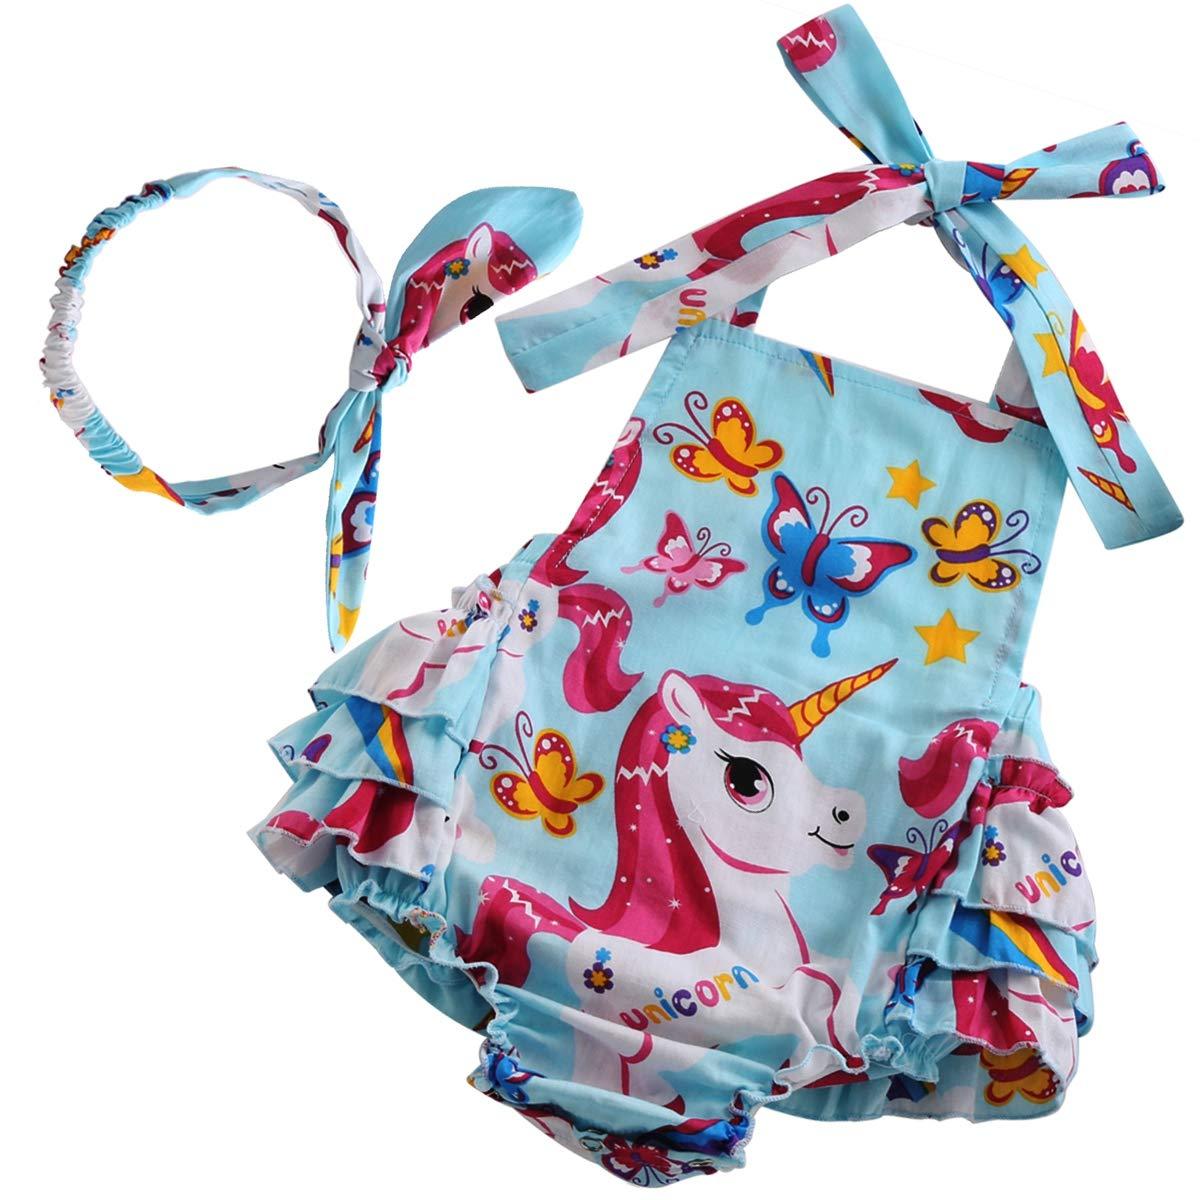 PrinceSasa Newborn Size Clothes Baby Girl Ruffle